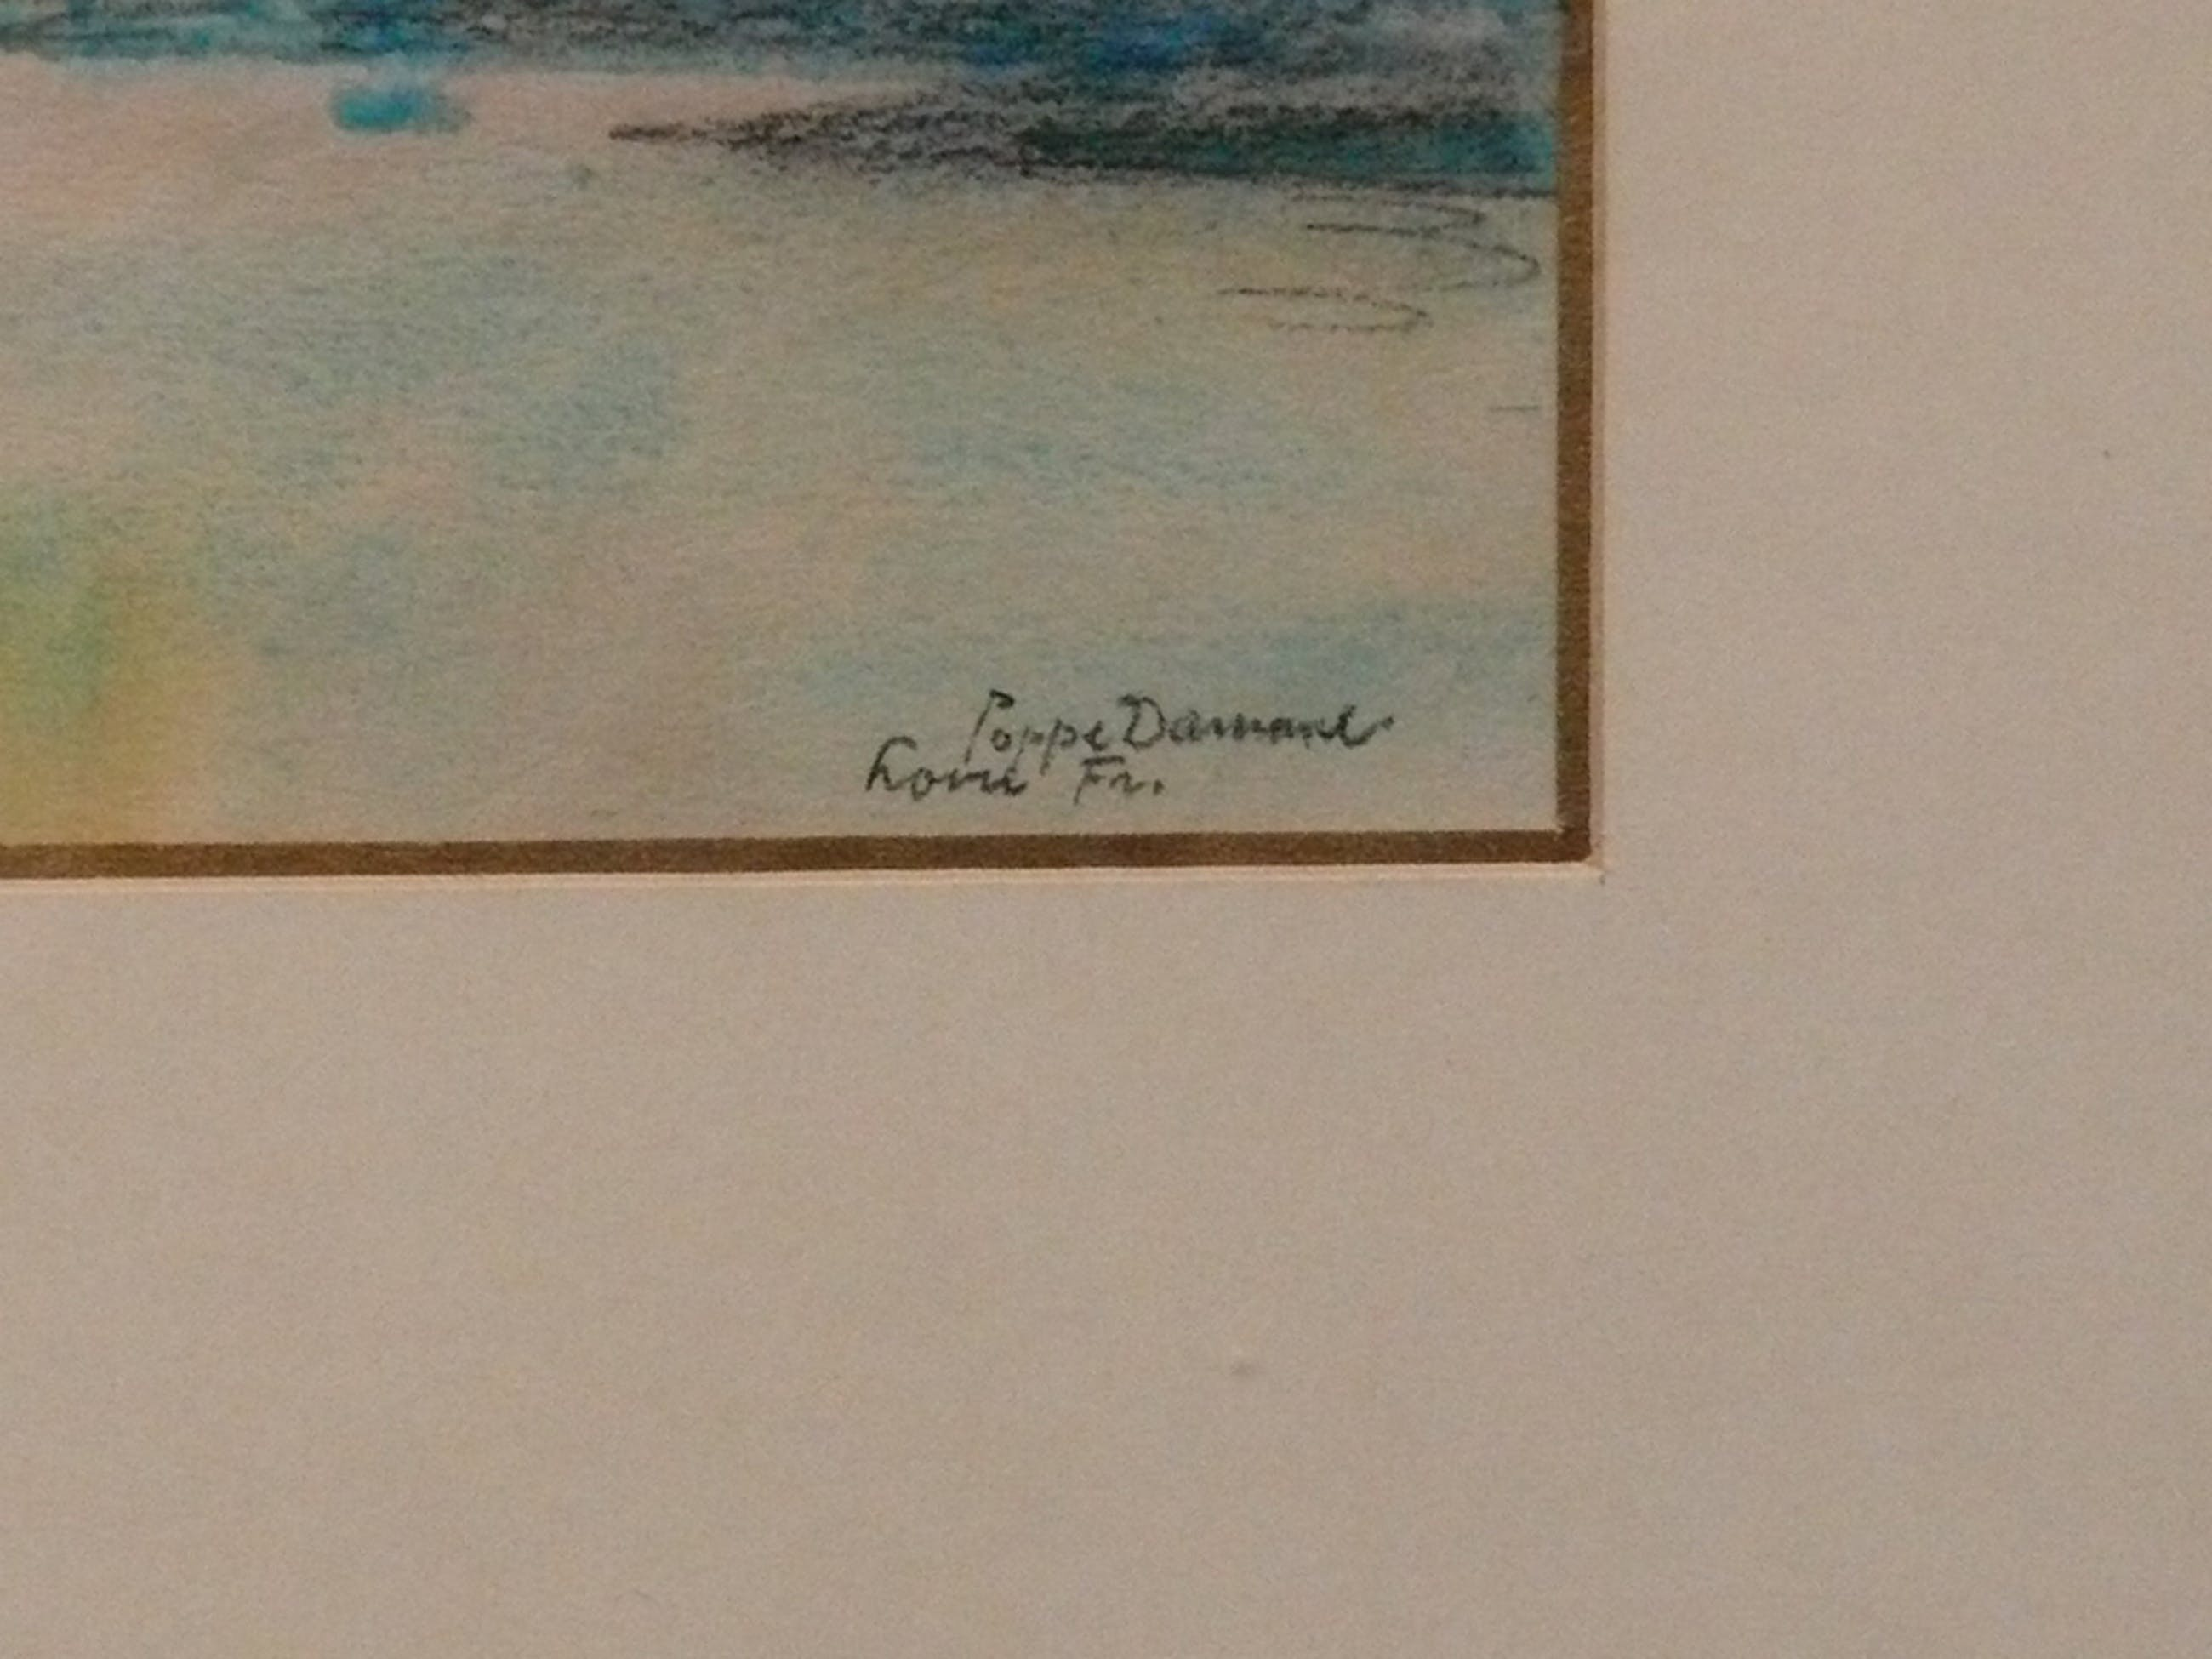 Poppe Damave (1921-1988), Tekening, Loire Frankrijk kopen? Bied vanaf 20!